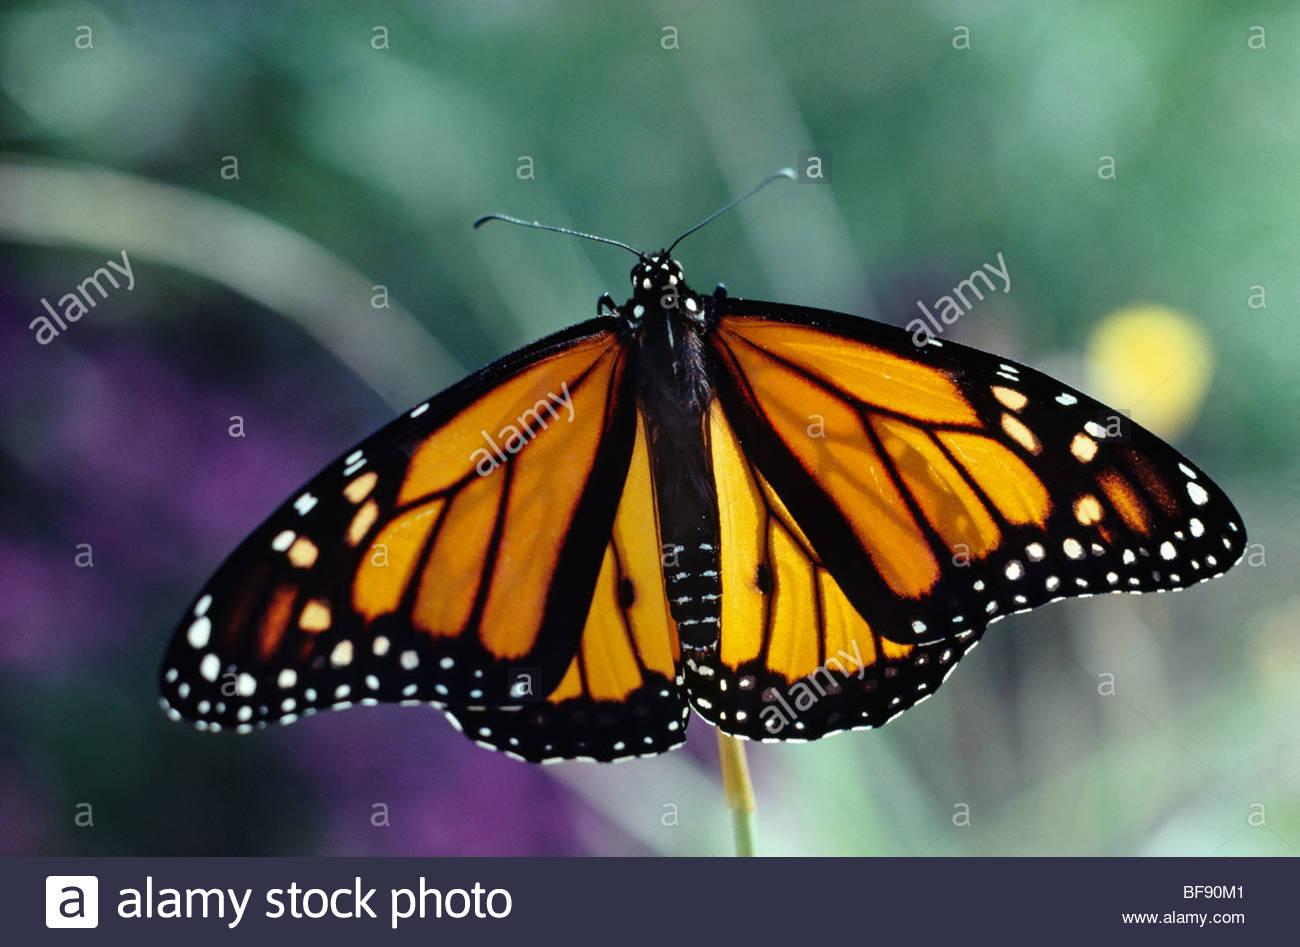 Monarch butterfly, Danaus plexippus, California - Stock Image